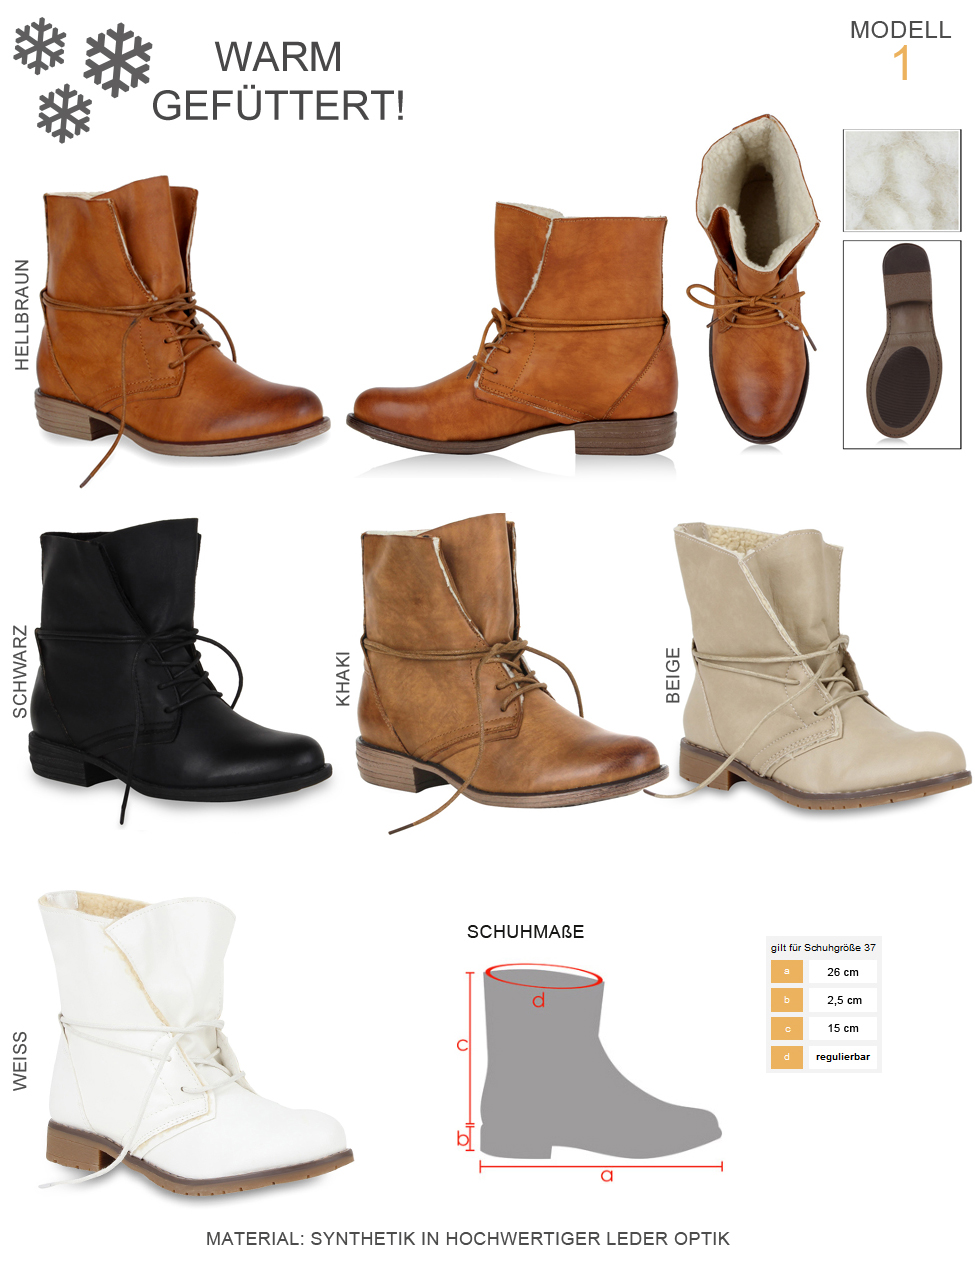 36-41 Schuhe Damen Stiefeletten Worker Boots /& Cowboy Stiefel 99284 Gr